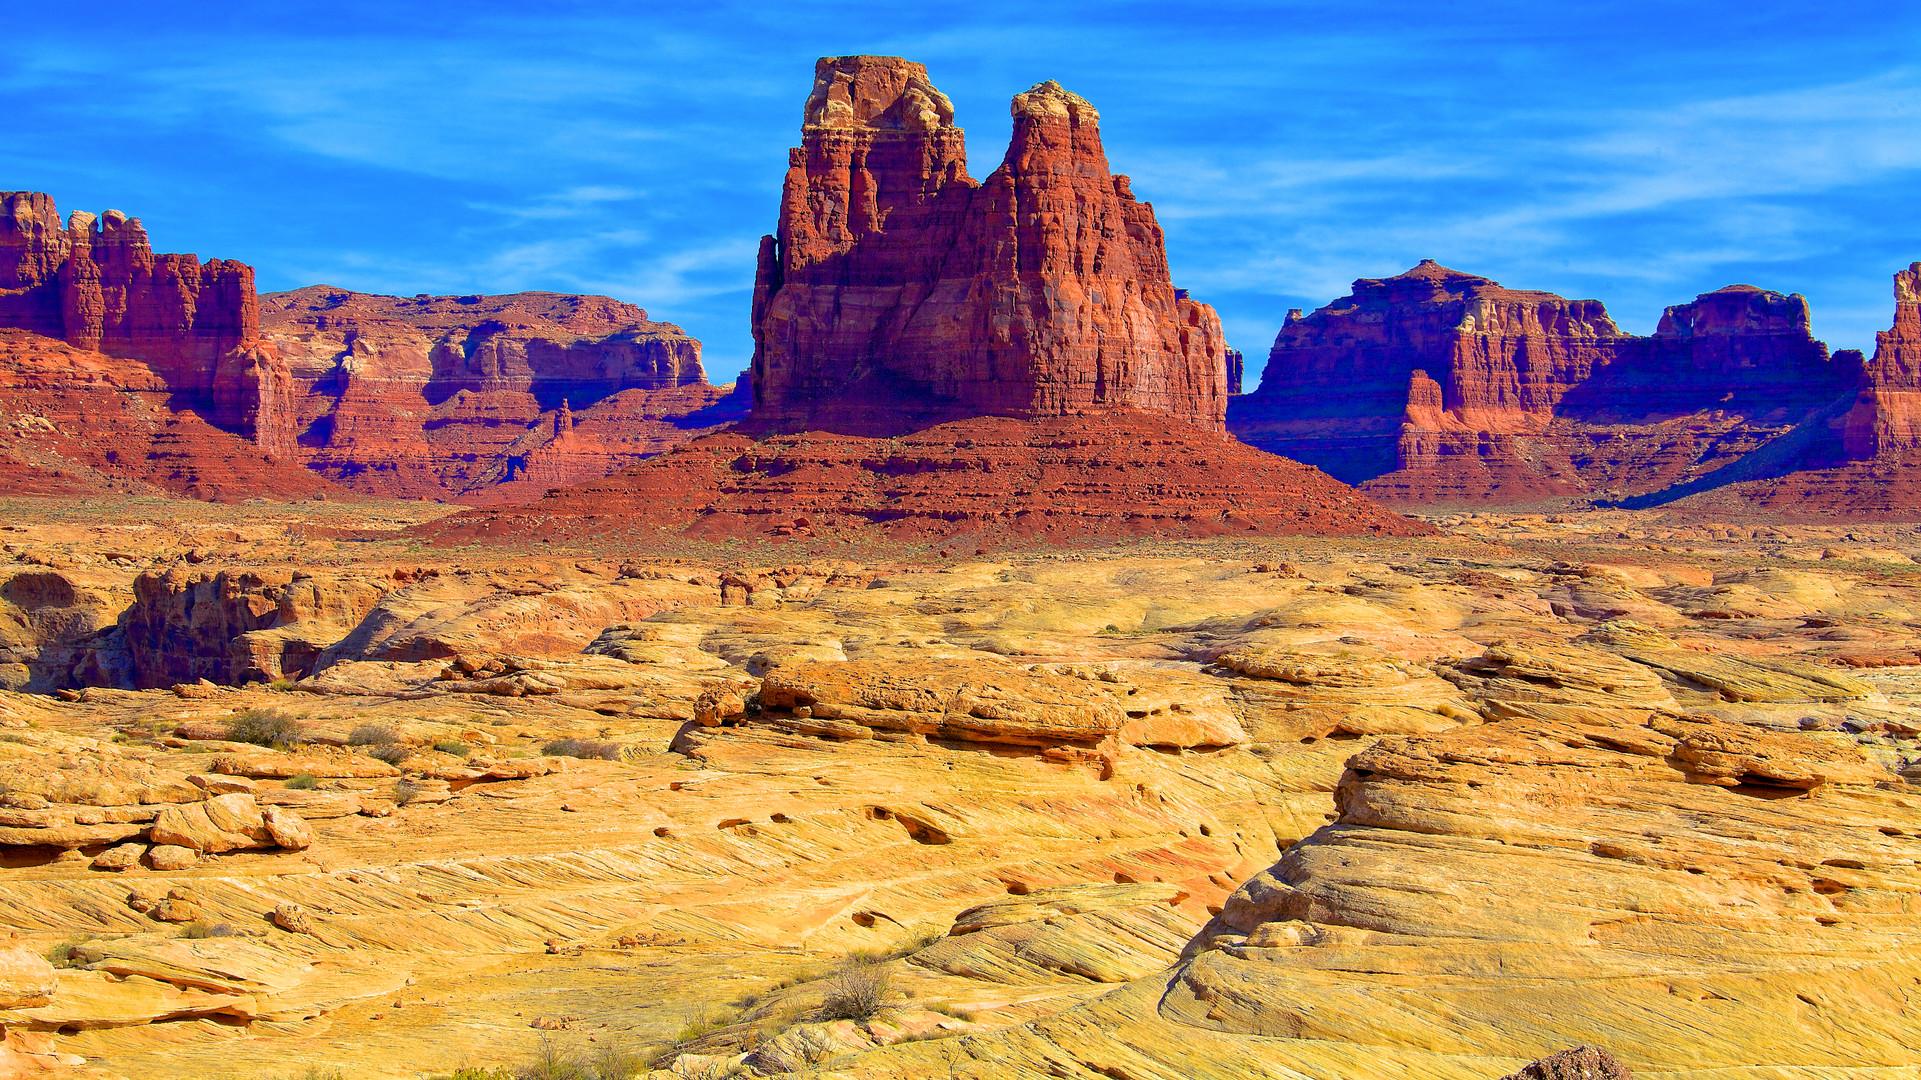 Monolith at southern Canyonlands